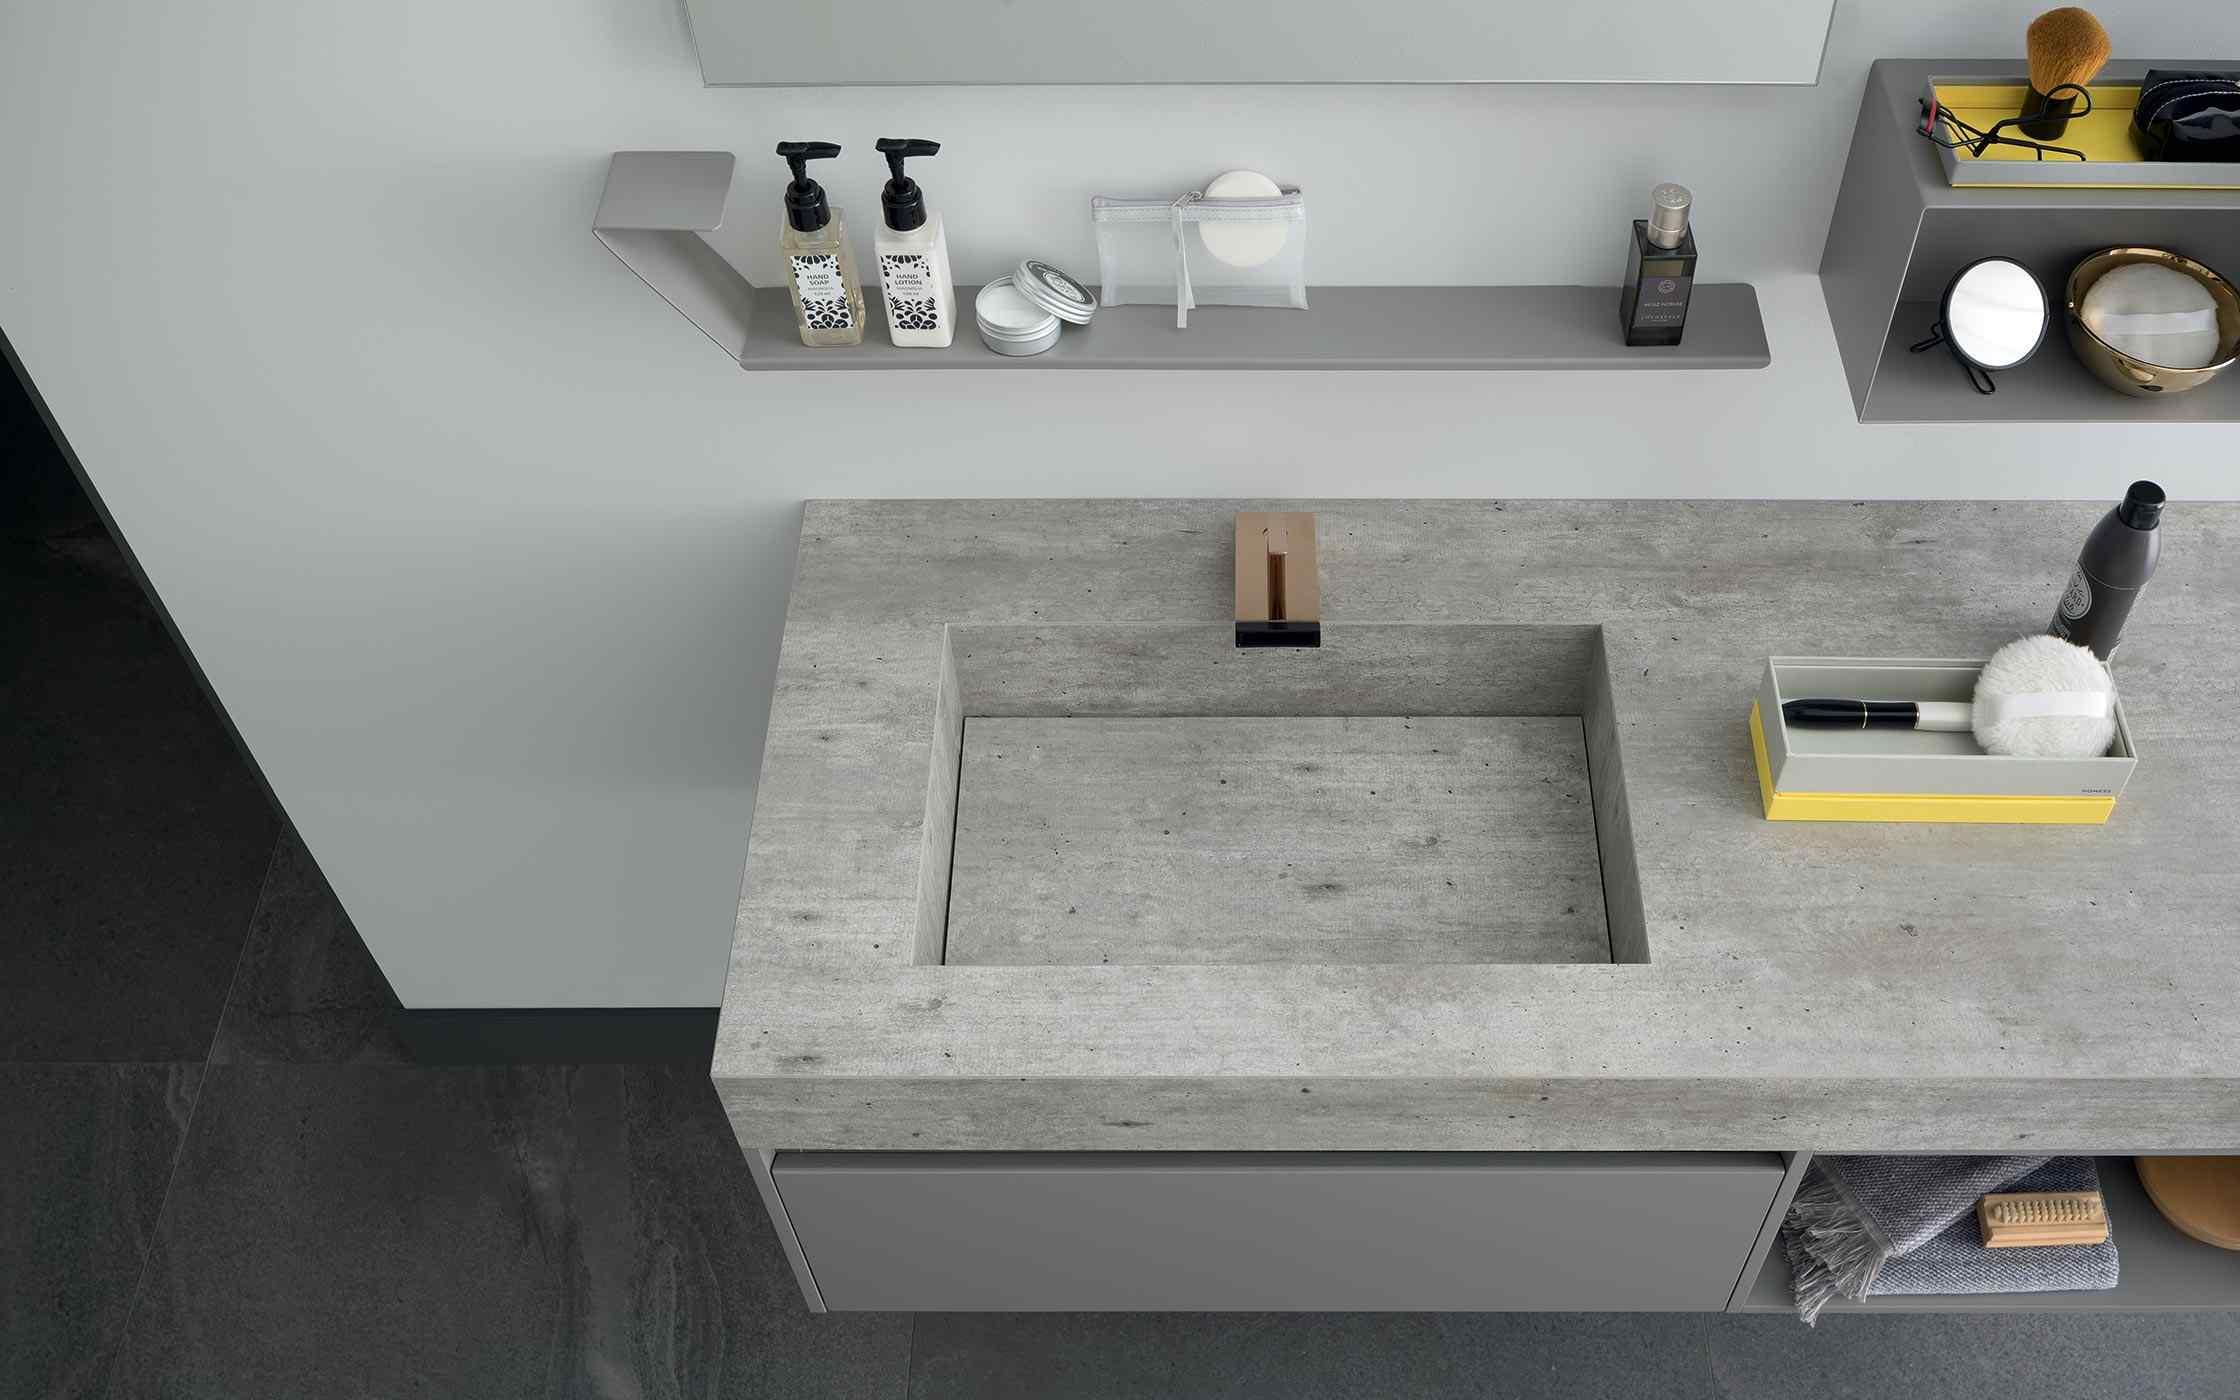 89cm wall mounted vanity unit